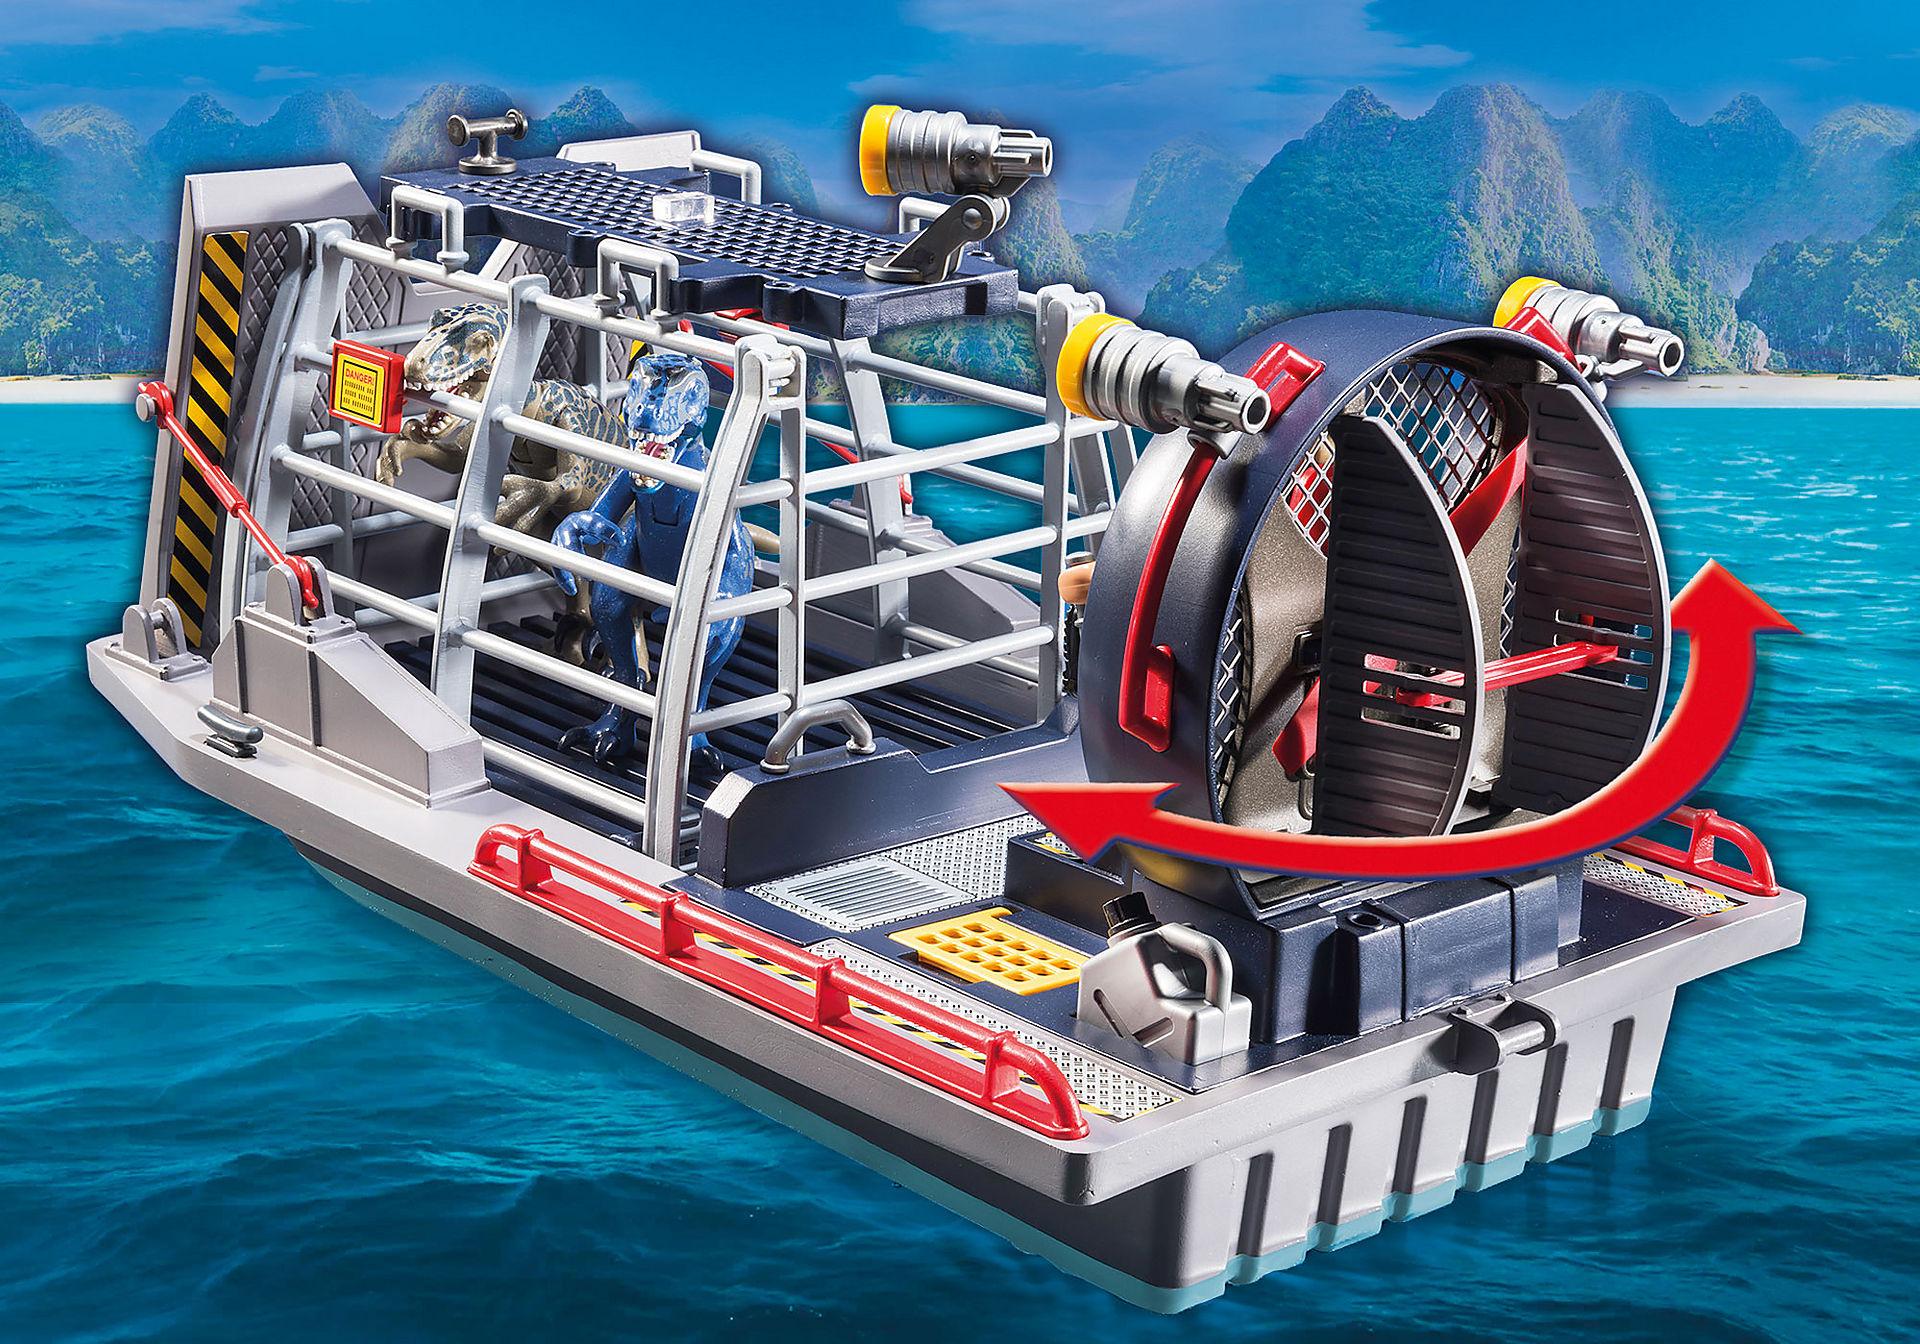 http://media.playmobil.com/i/playmobil/9433_product_extra2/Propellerboot mit Dinokäfig